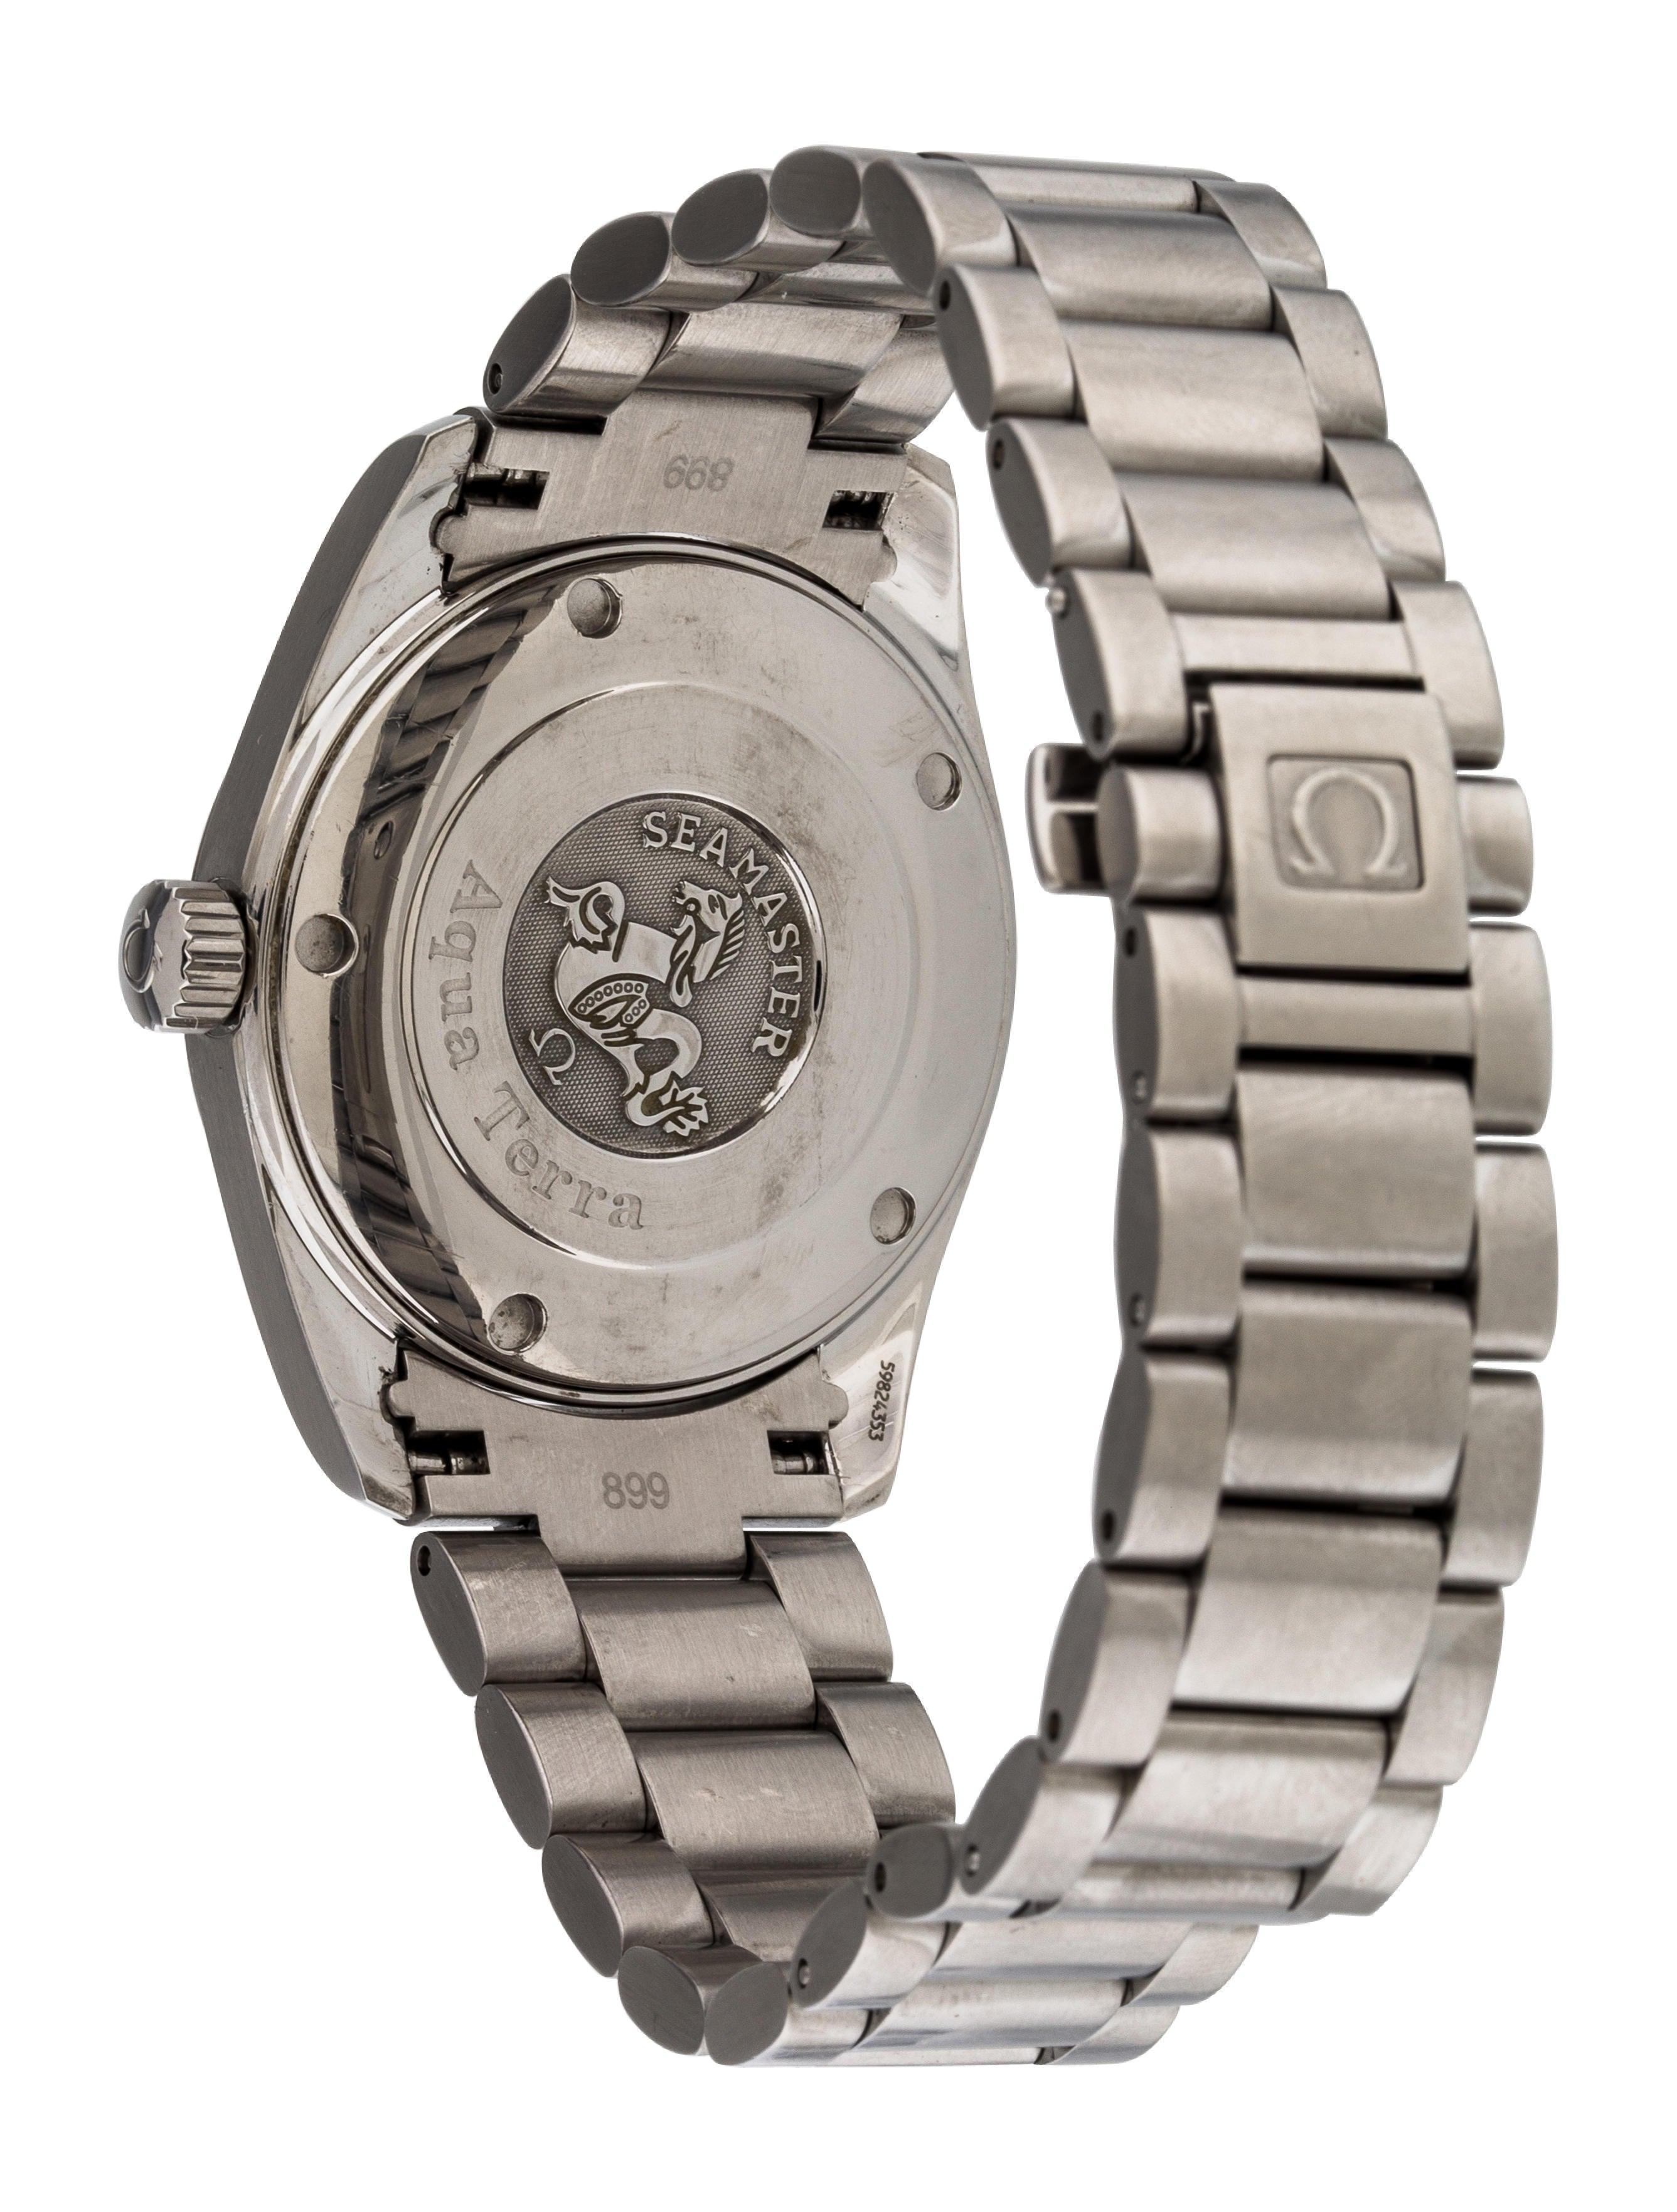 Omega aqua terra watch bracelet omg20942 the realreal for Aqua marine watches